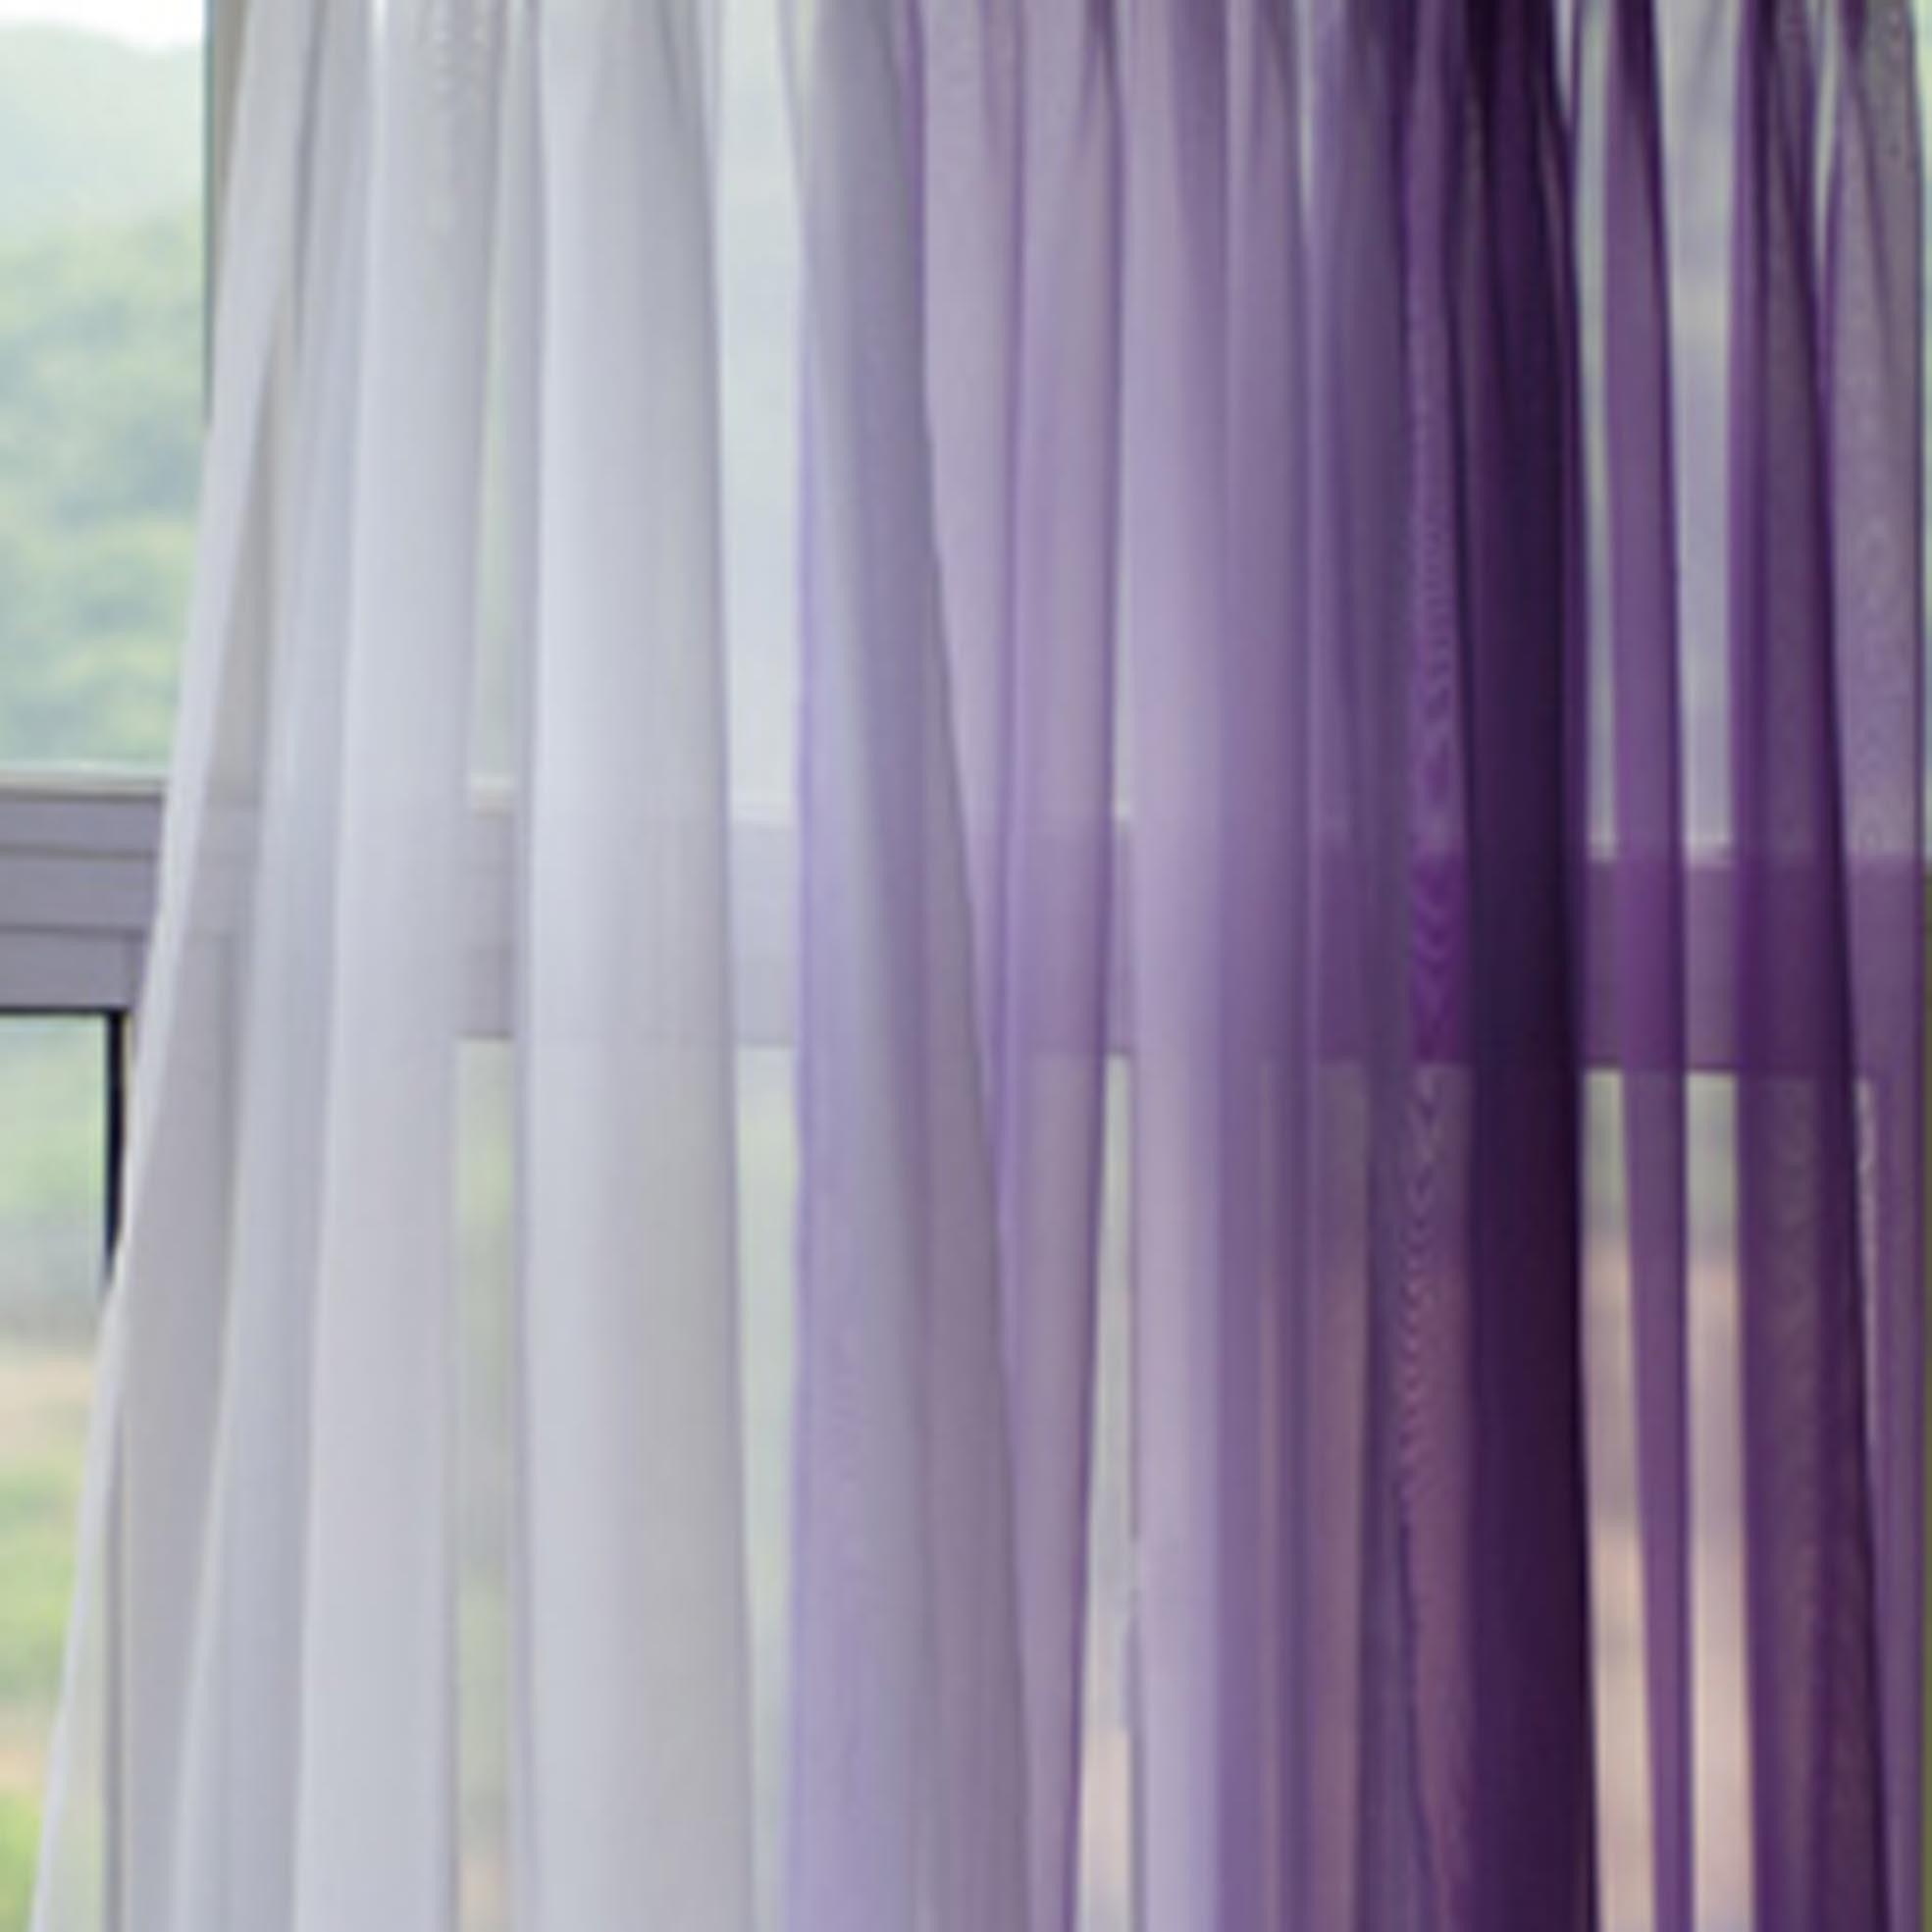 Mauve Sheer Curtains Regarding Mauve Sheer Curtains (View 18 of 25)